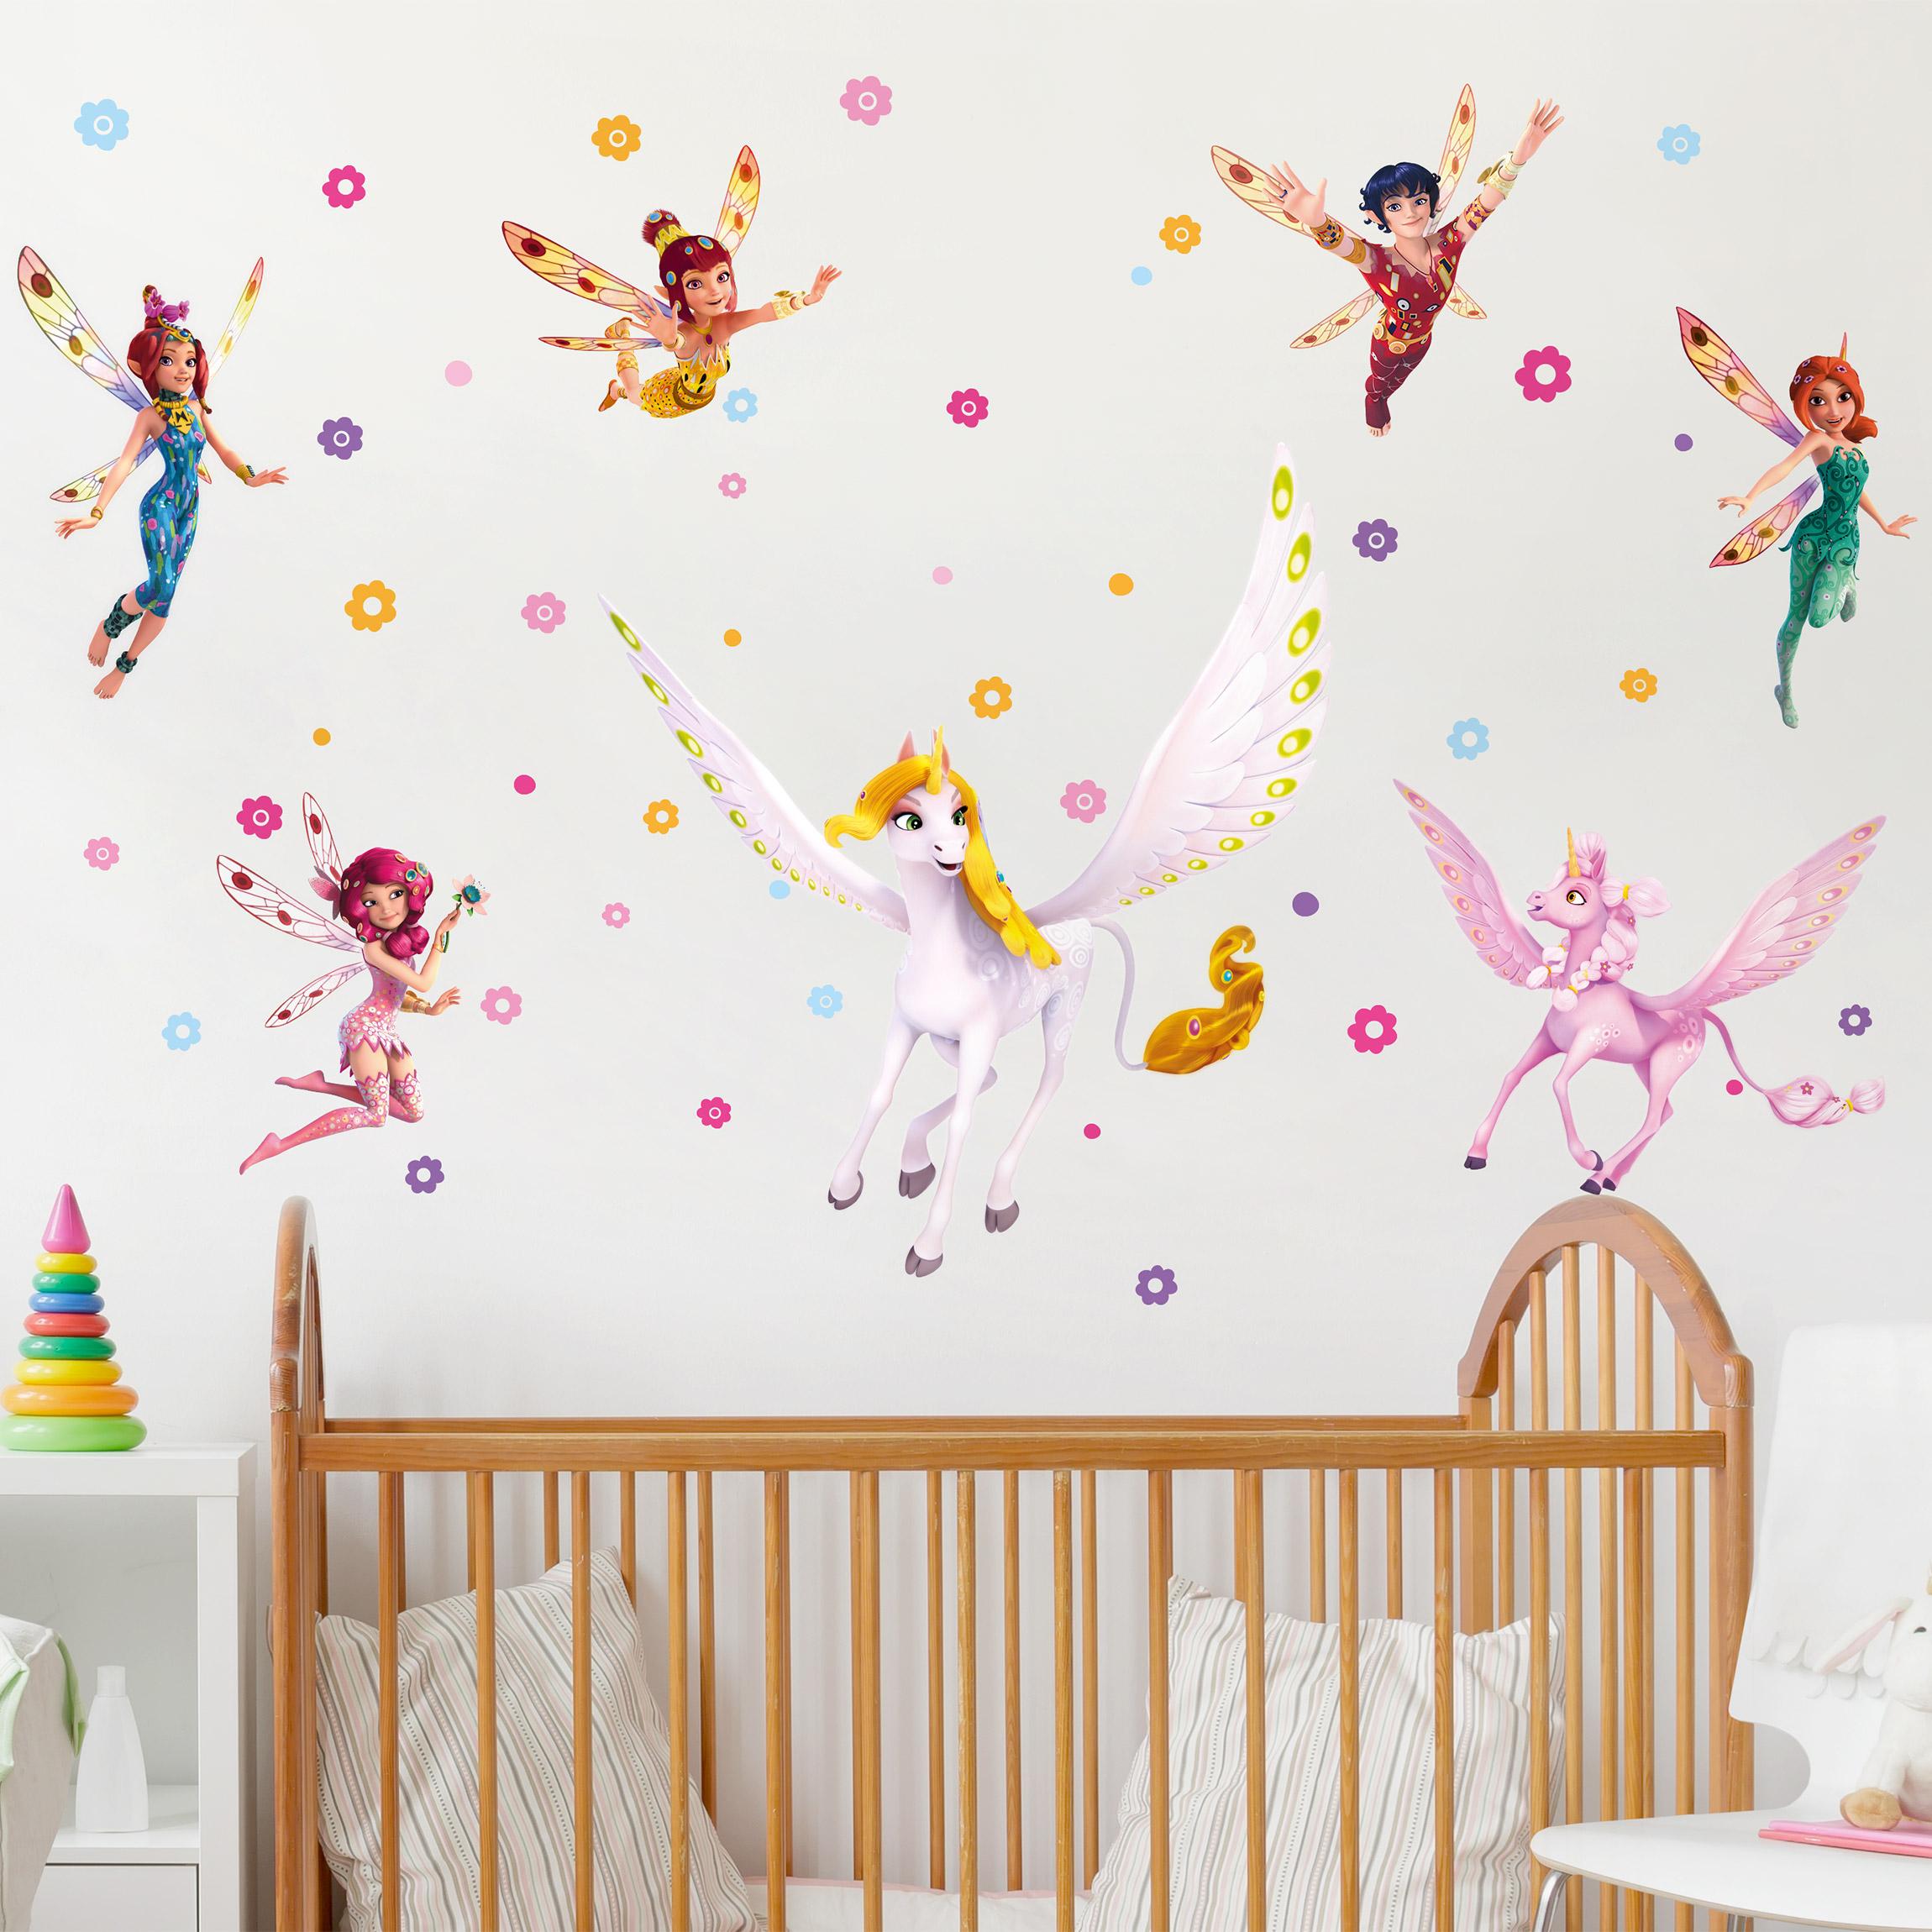 Wandtattoo Kinderzimmer Mia And Me Sara Onchao Kyara Mit Den Elfen